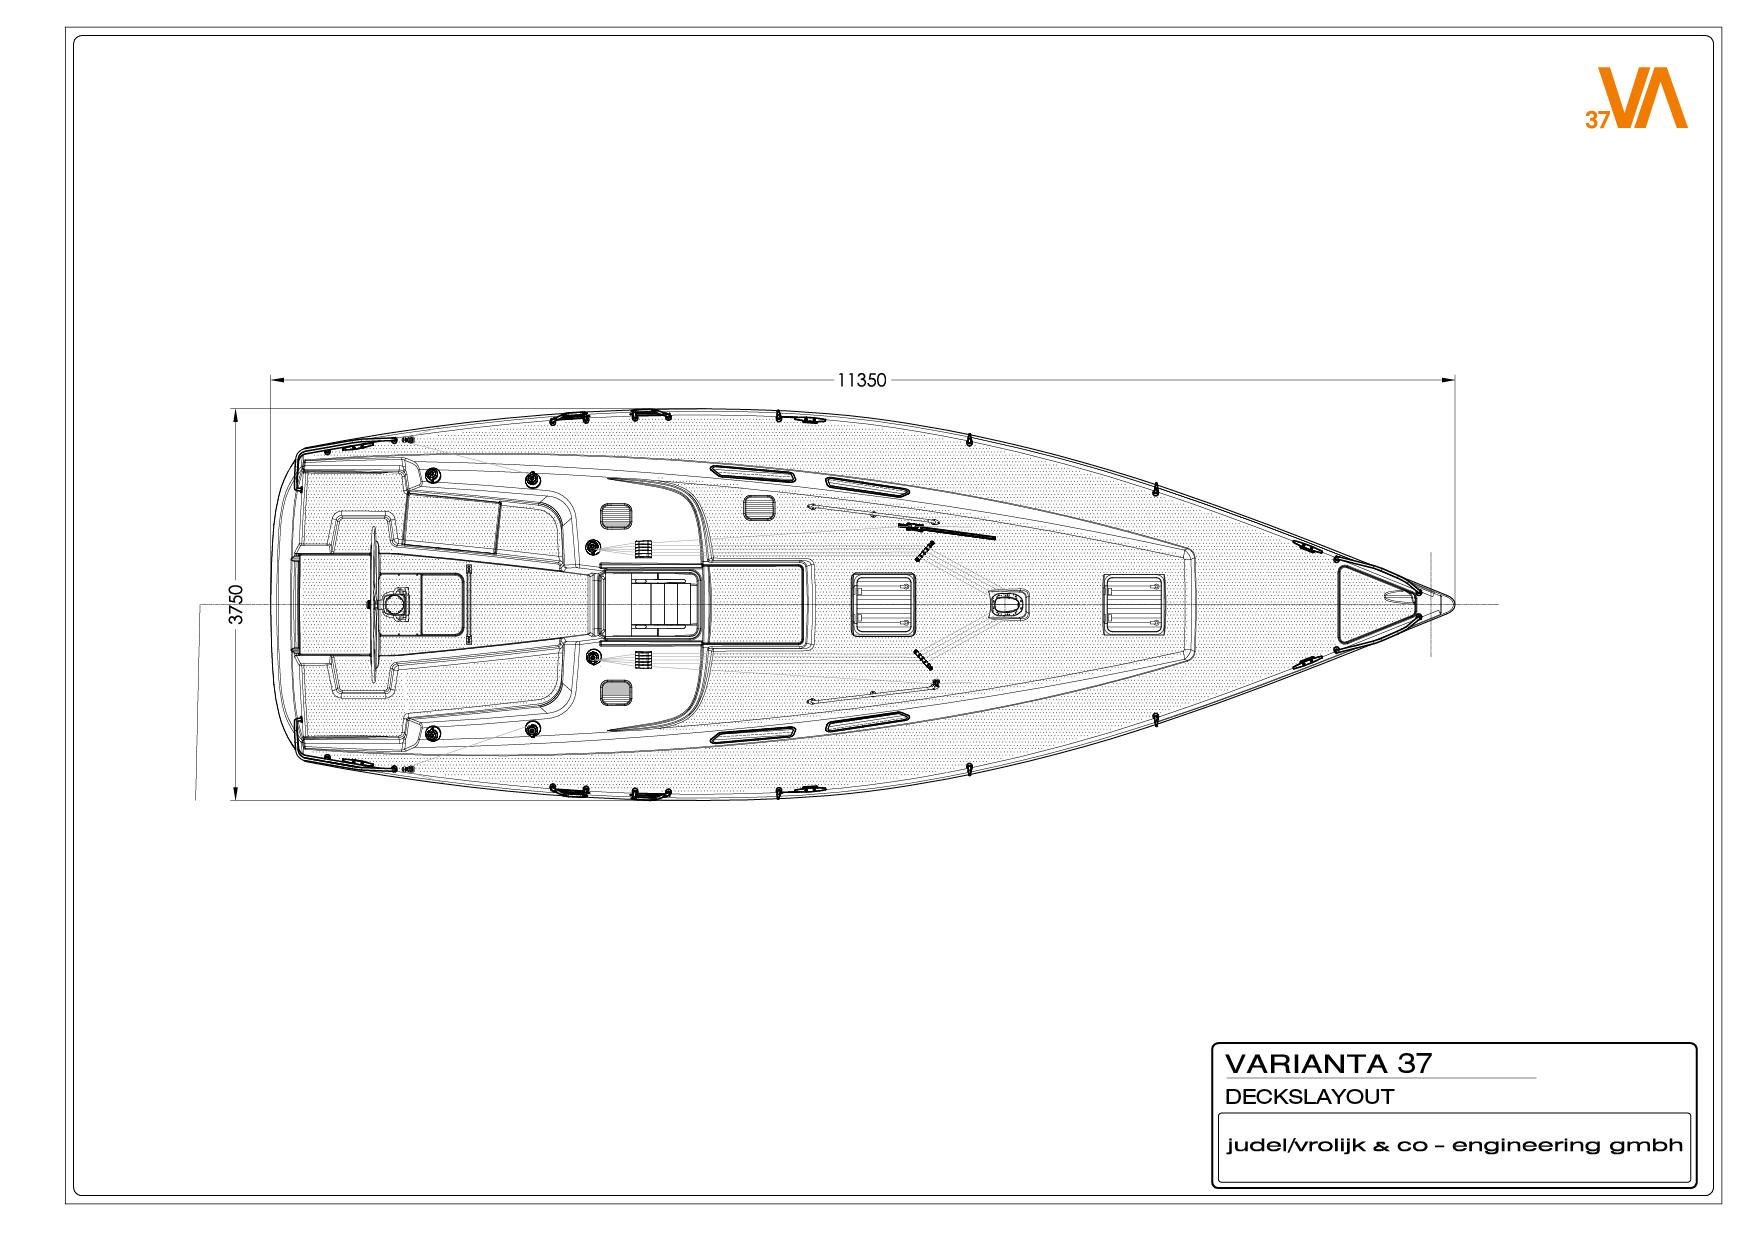 Varianta  - VARIANTA37_Deckslayout_low_082013-2f9a6.jpg